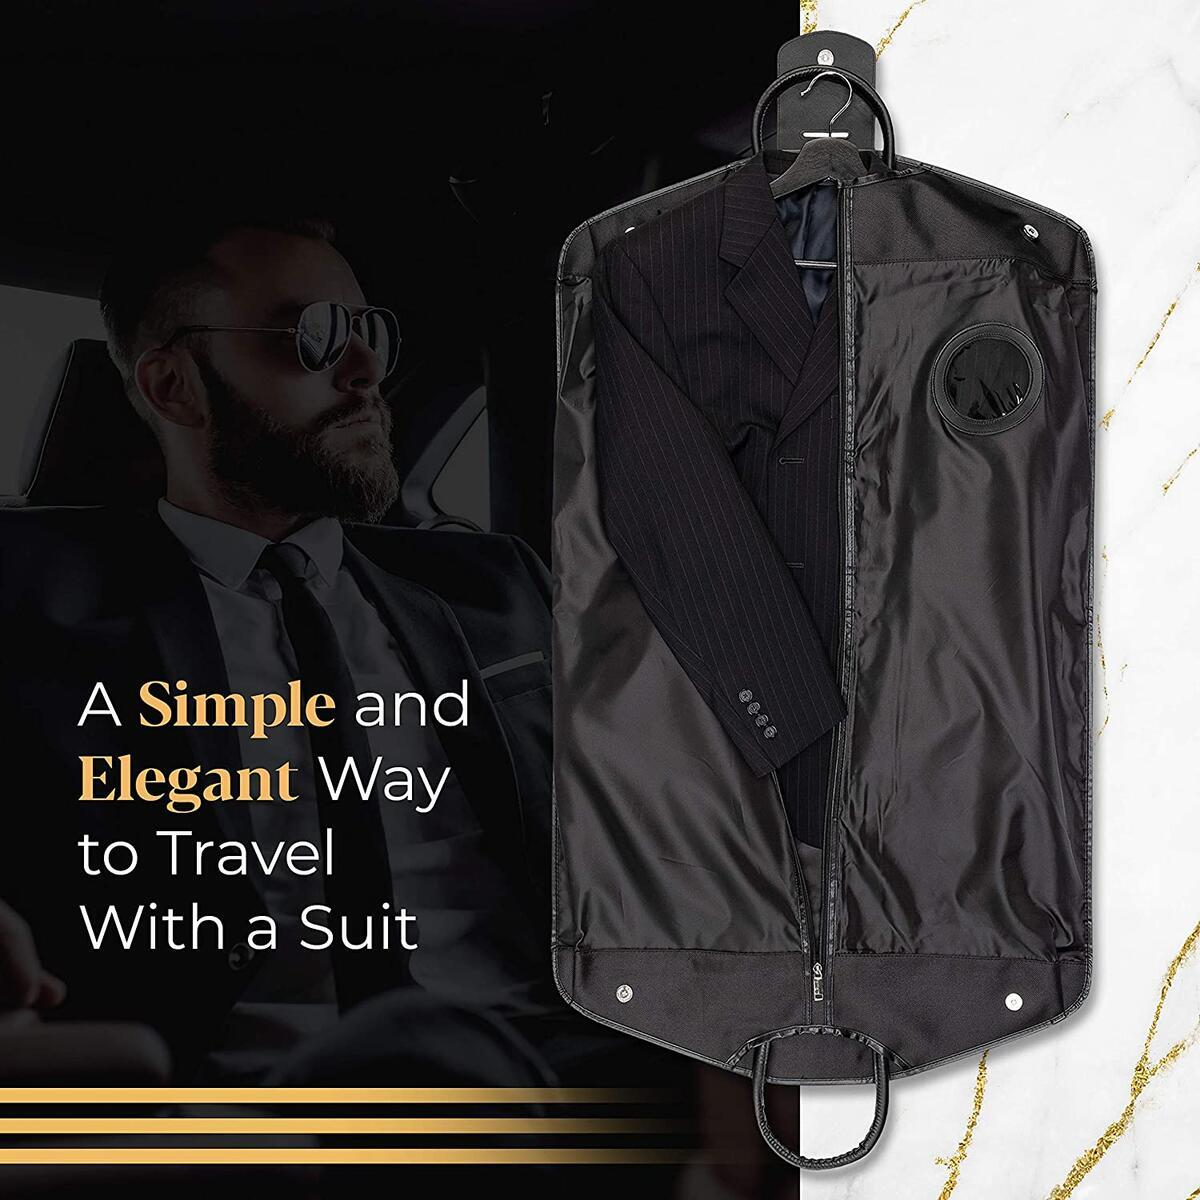 Tavisz Heavy Duty Premium Travel Suit Garment Bag